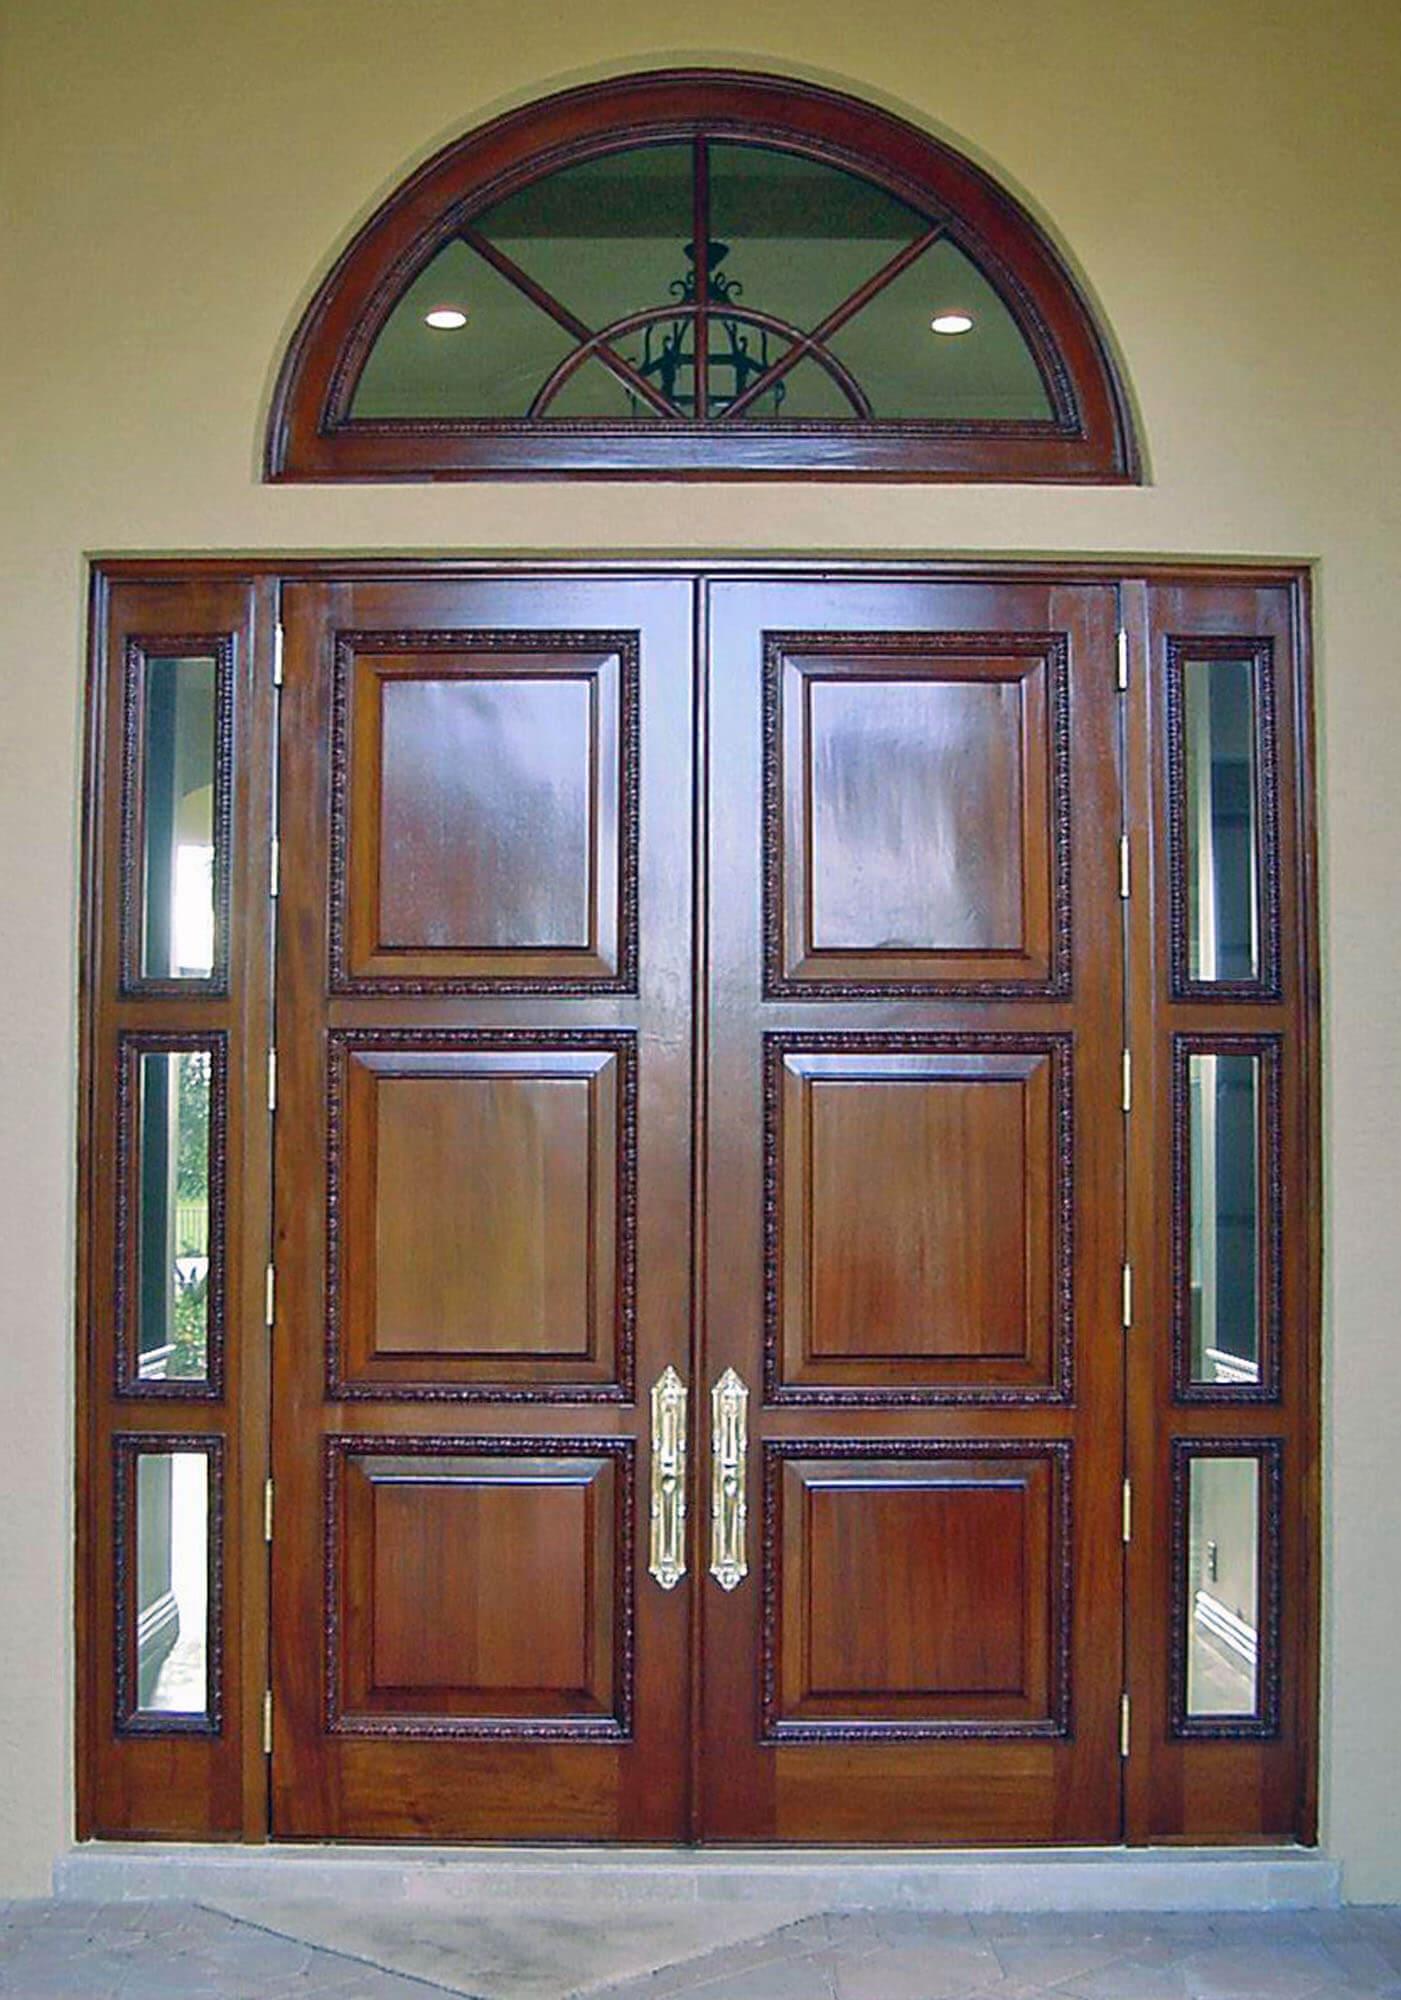 PALMETTO BAY VILLAGE. MAHOGANY ENTRANCE DOORS.